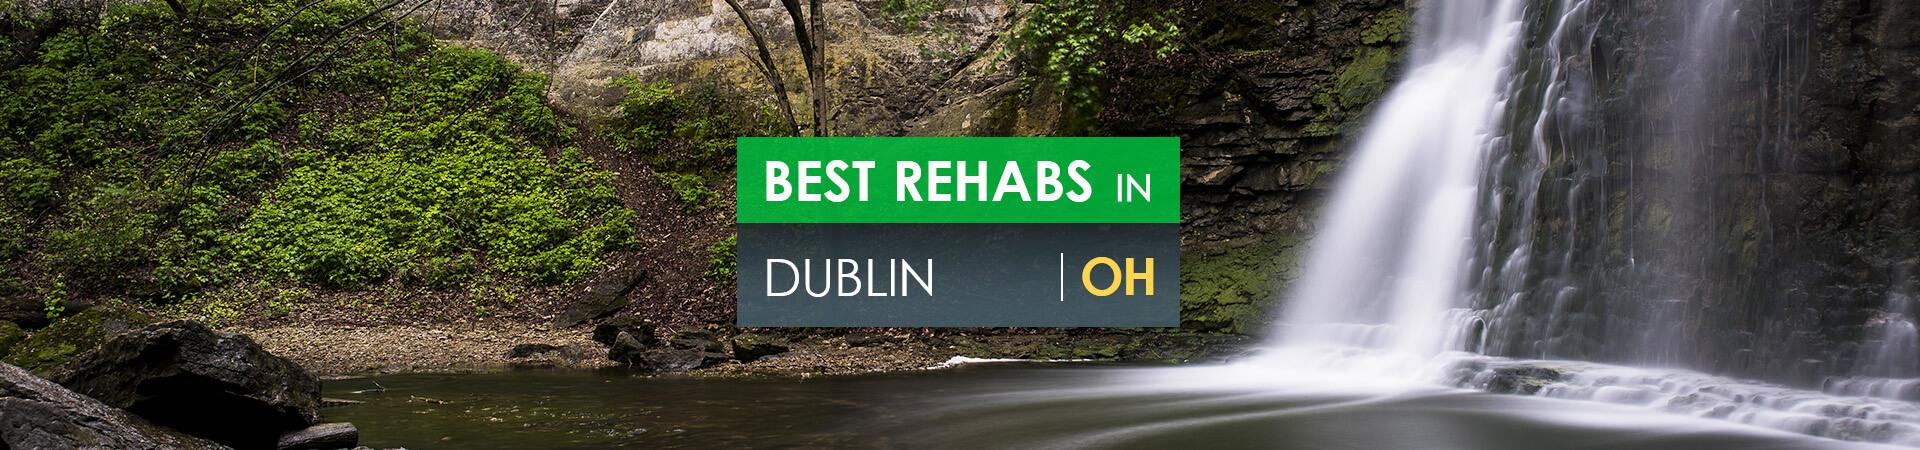 Best rehabs in Dublin, OH